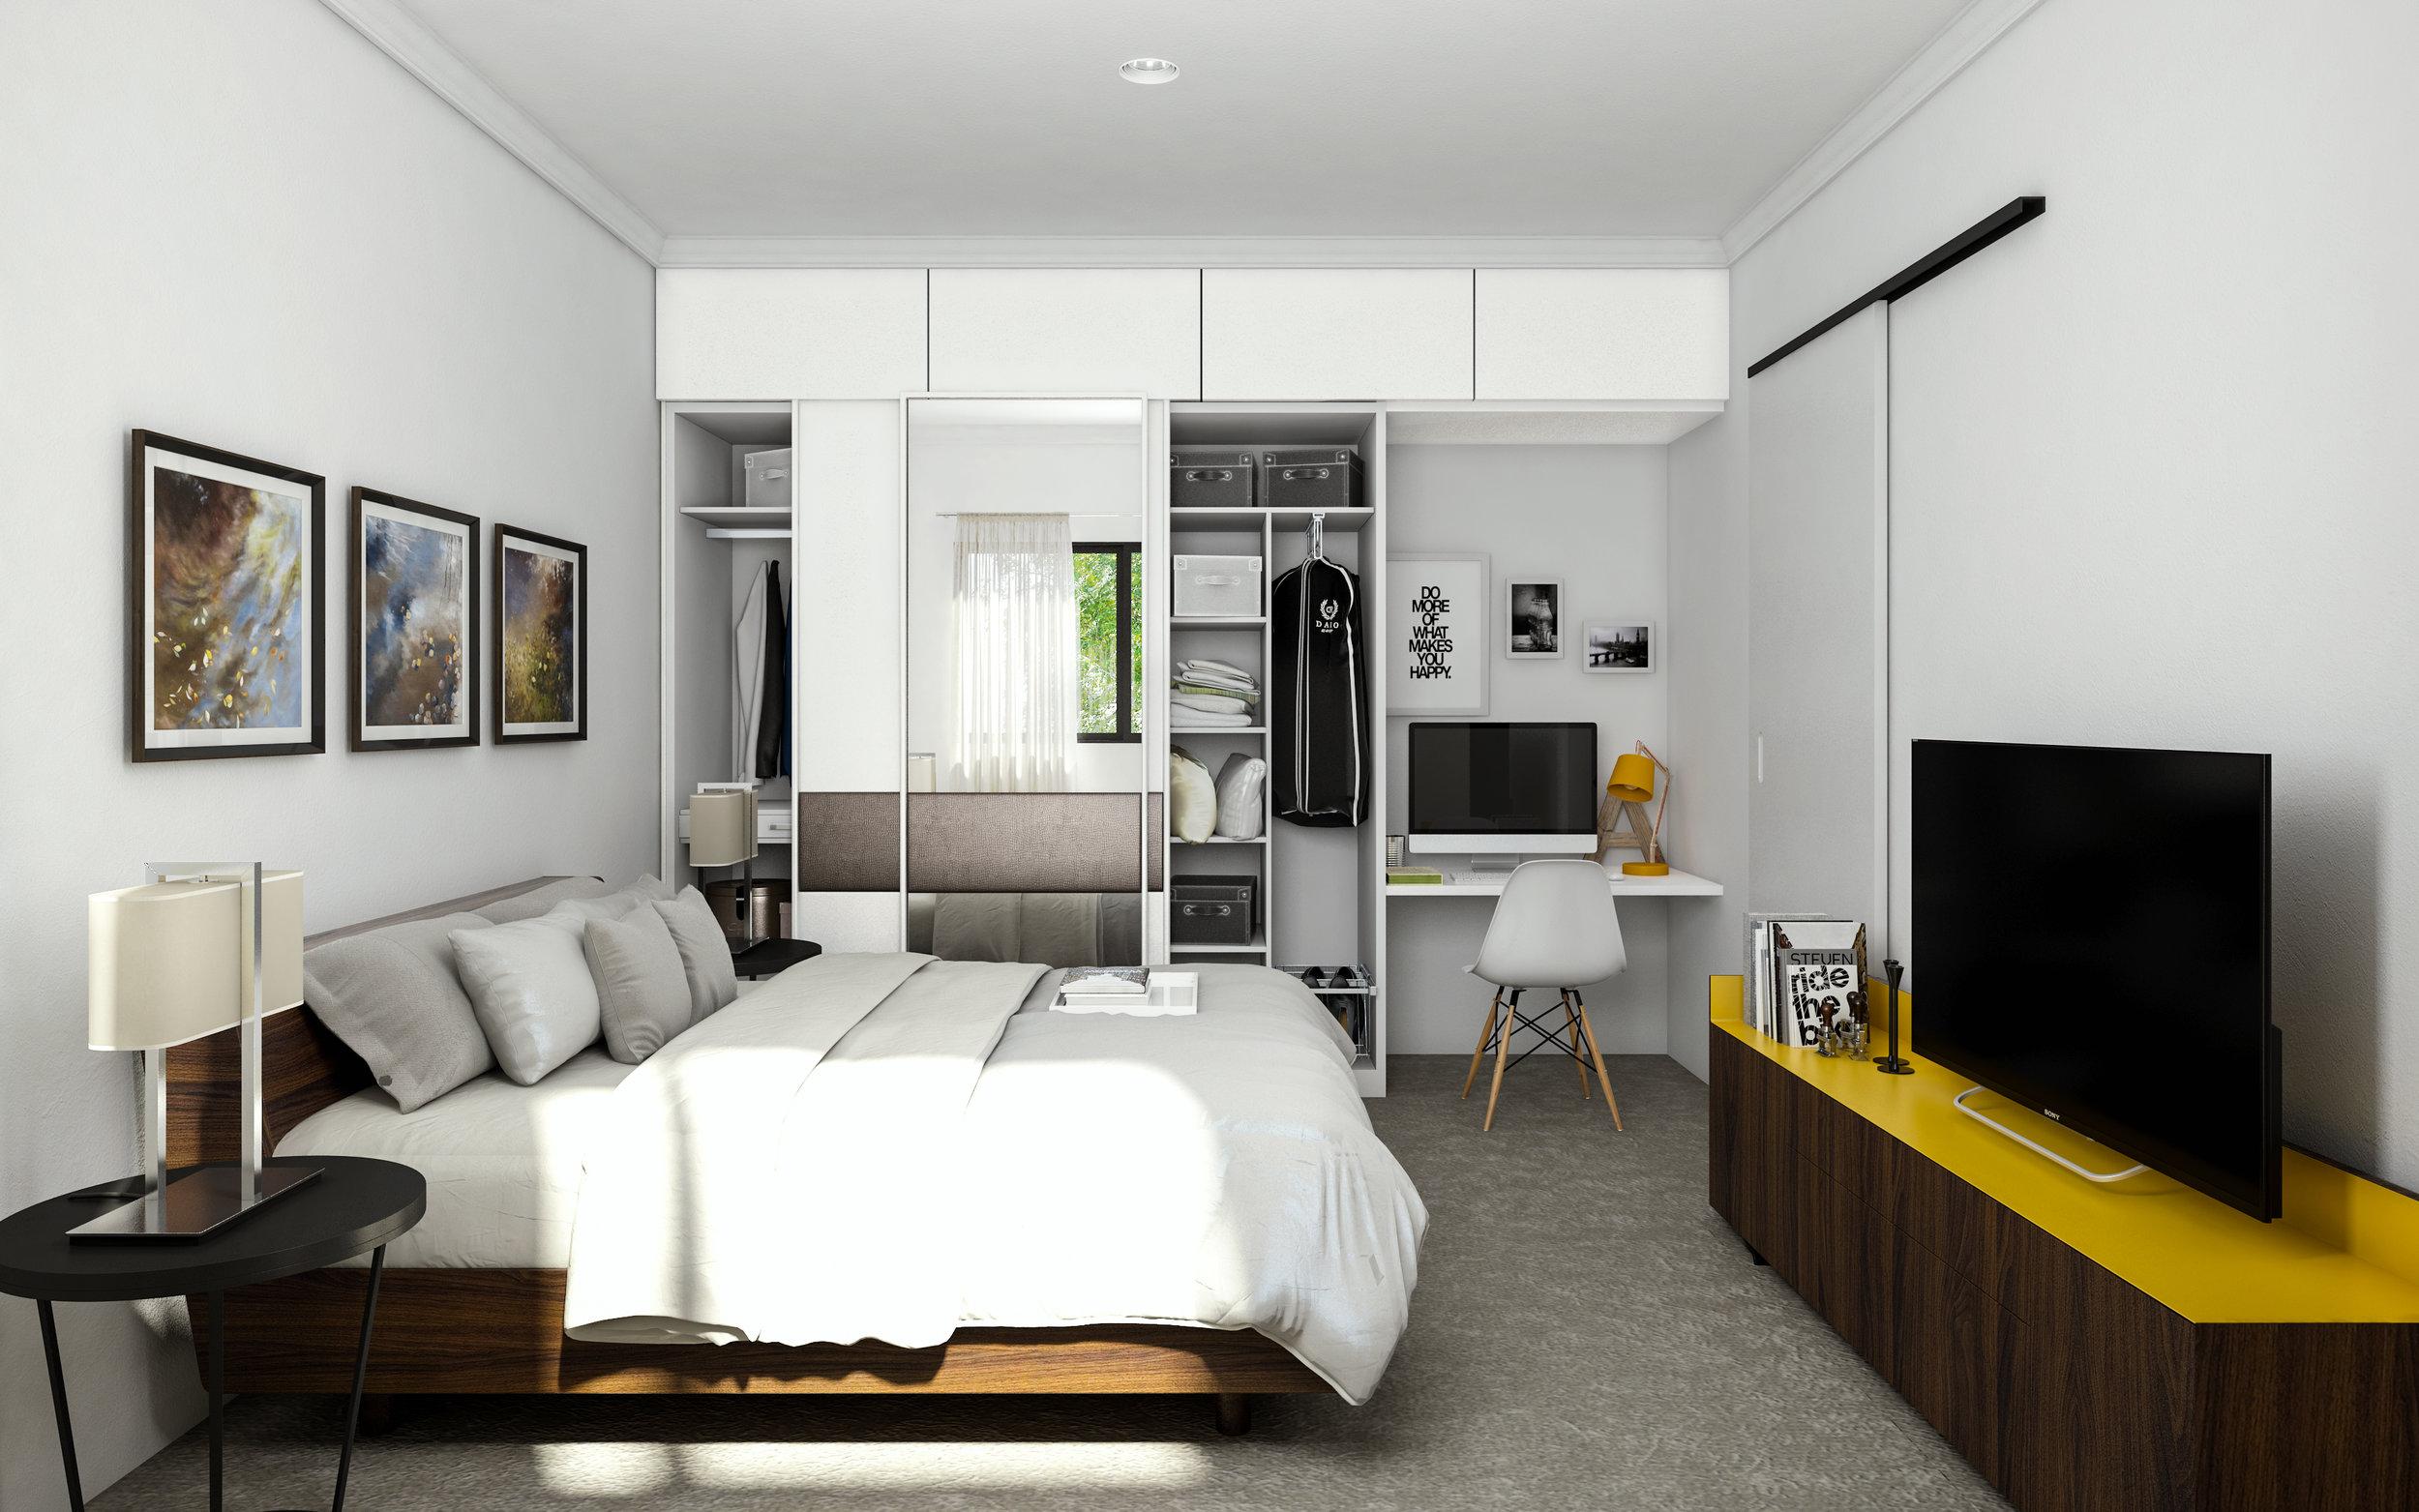 RSAS_180531_Bedroom_HD.jpg